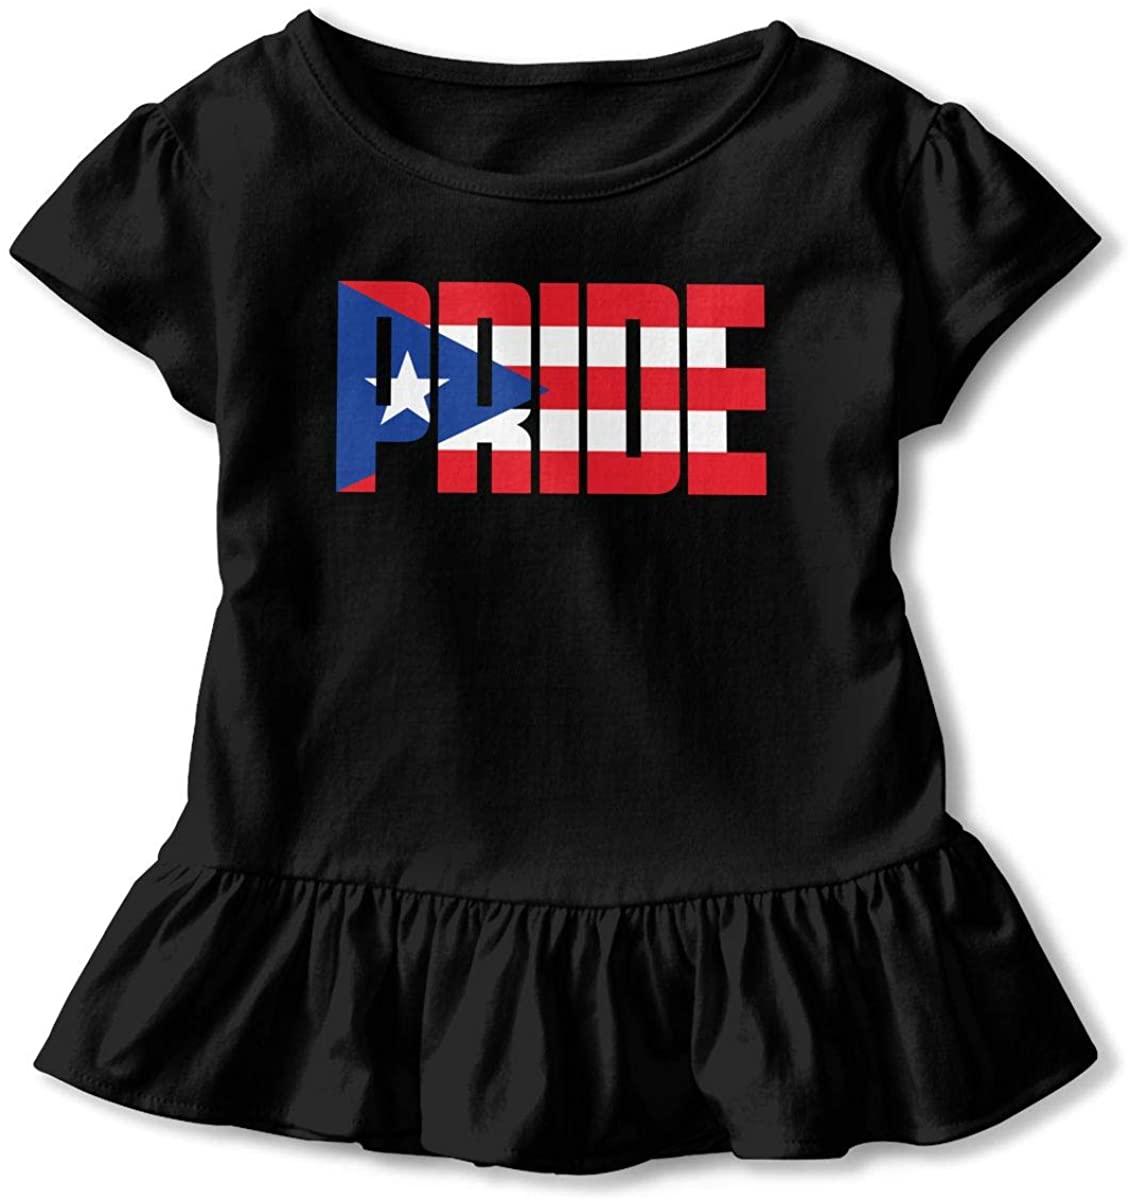 Toddler Girl's Ruffle T-Shirt Puerto Rico Pride Short Sleeve 2-6T